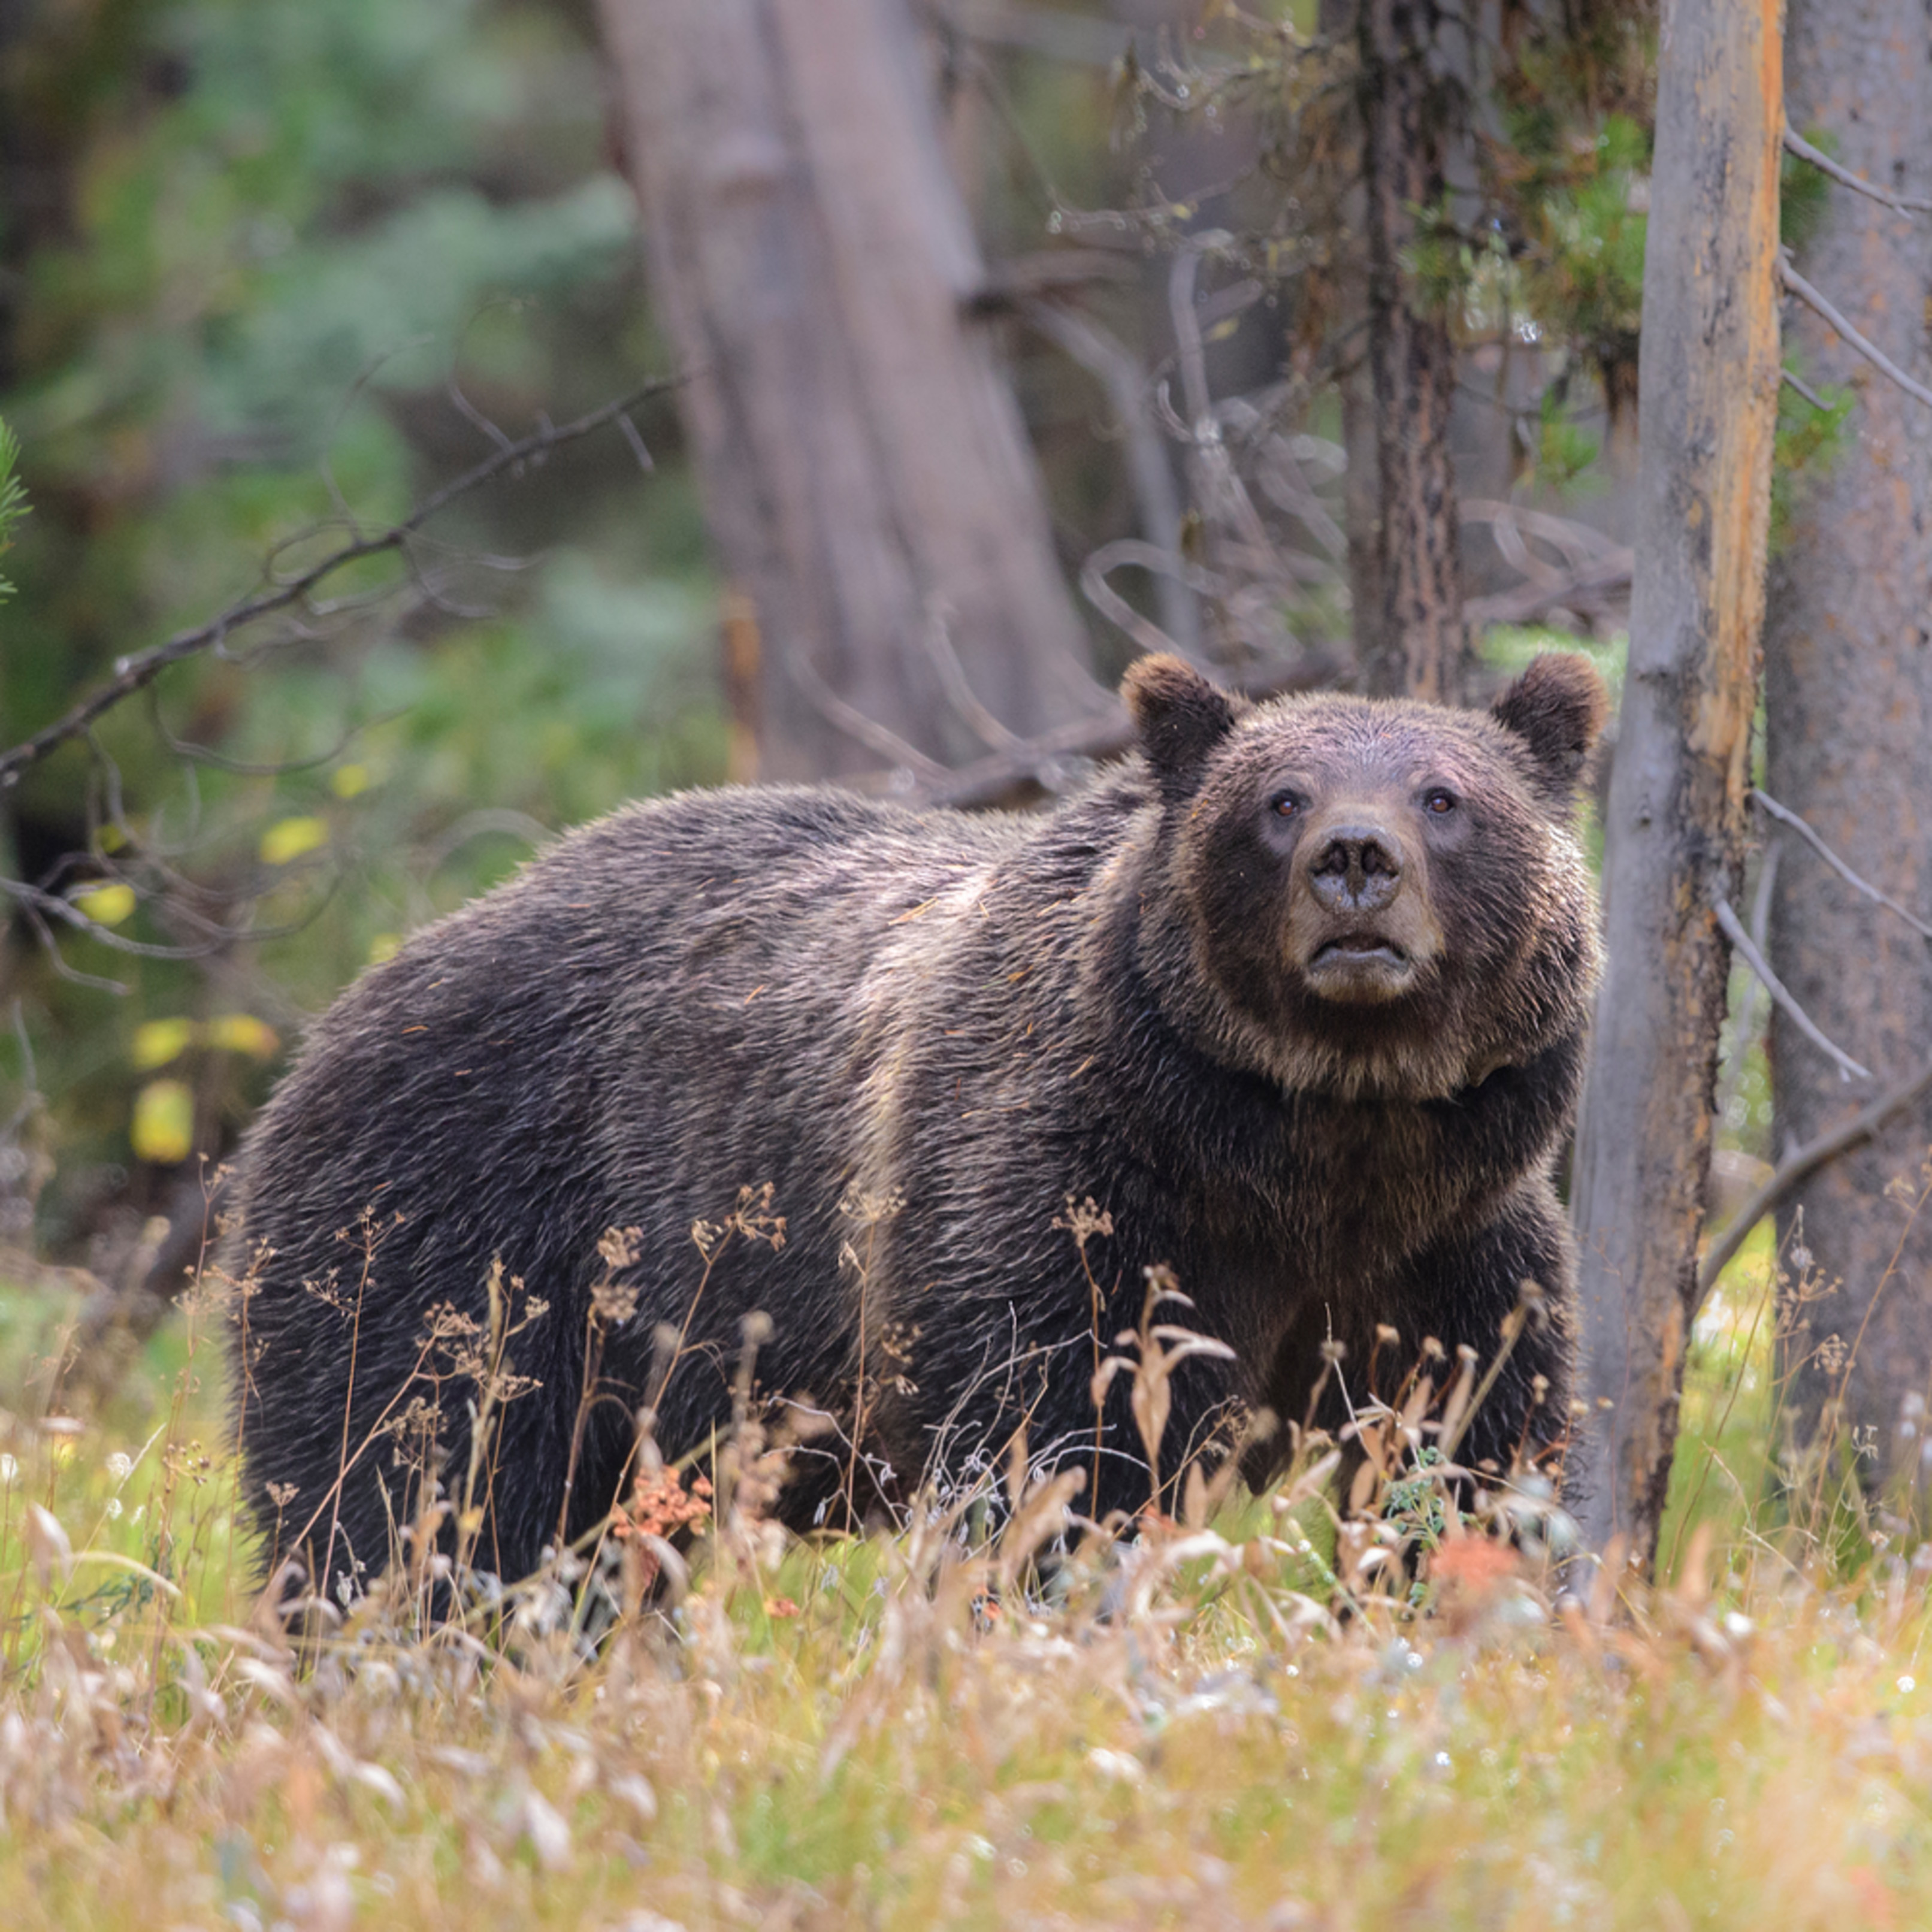 X1914 grizzly encounter 3 2 4832 x 3225 j100argb s1o93p4h4v3rt 20180921 1454 woqa4n